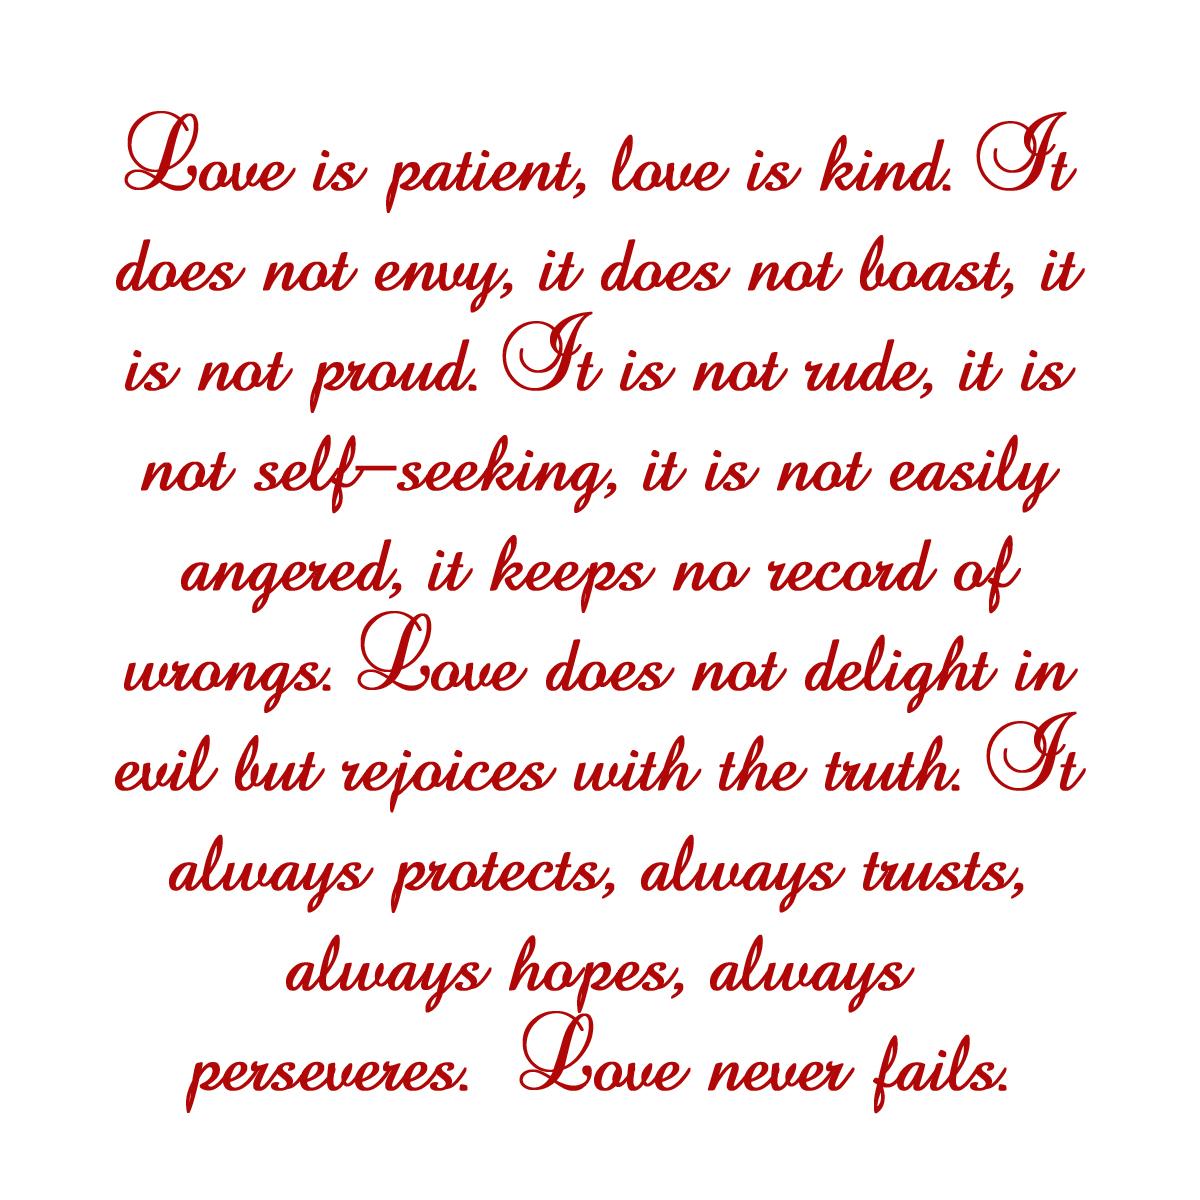 love is good love is kind